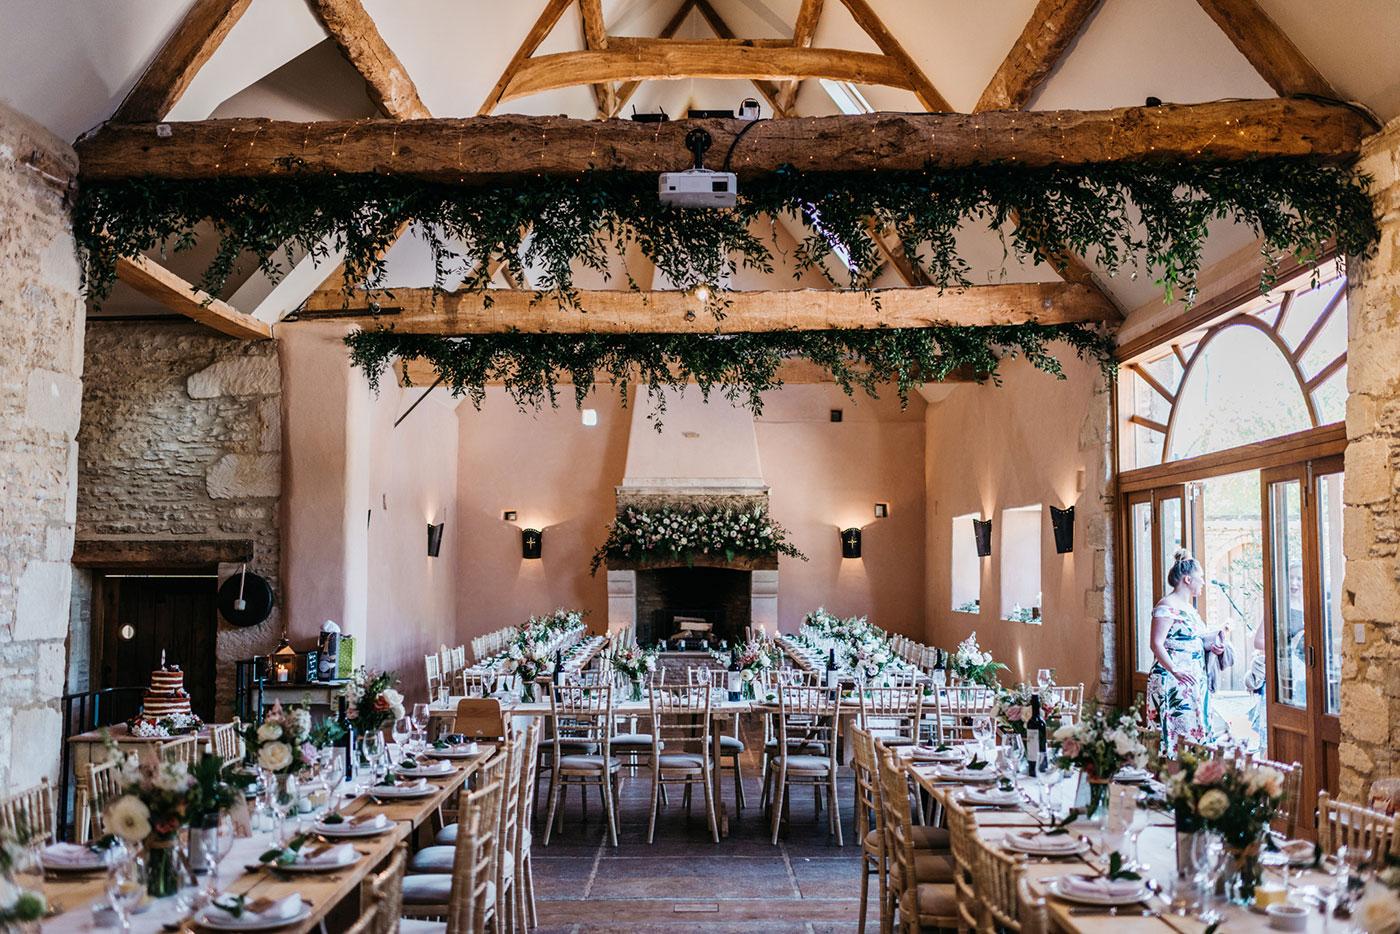 Oxleaze Barn Wedding Venue